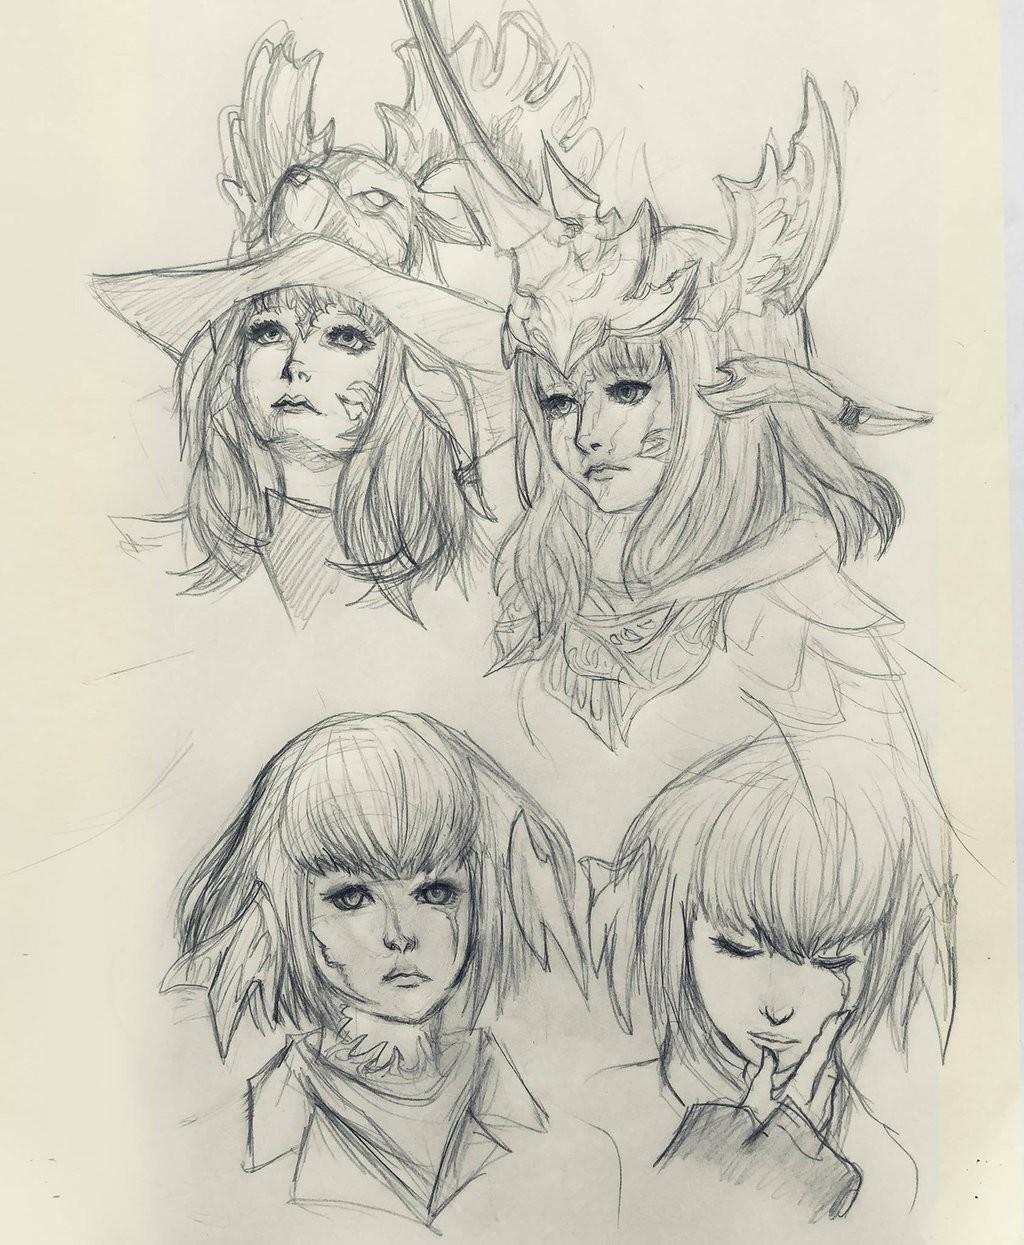 FFXIV sketches